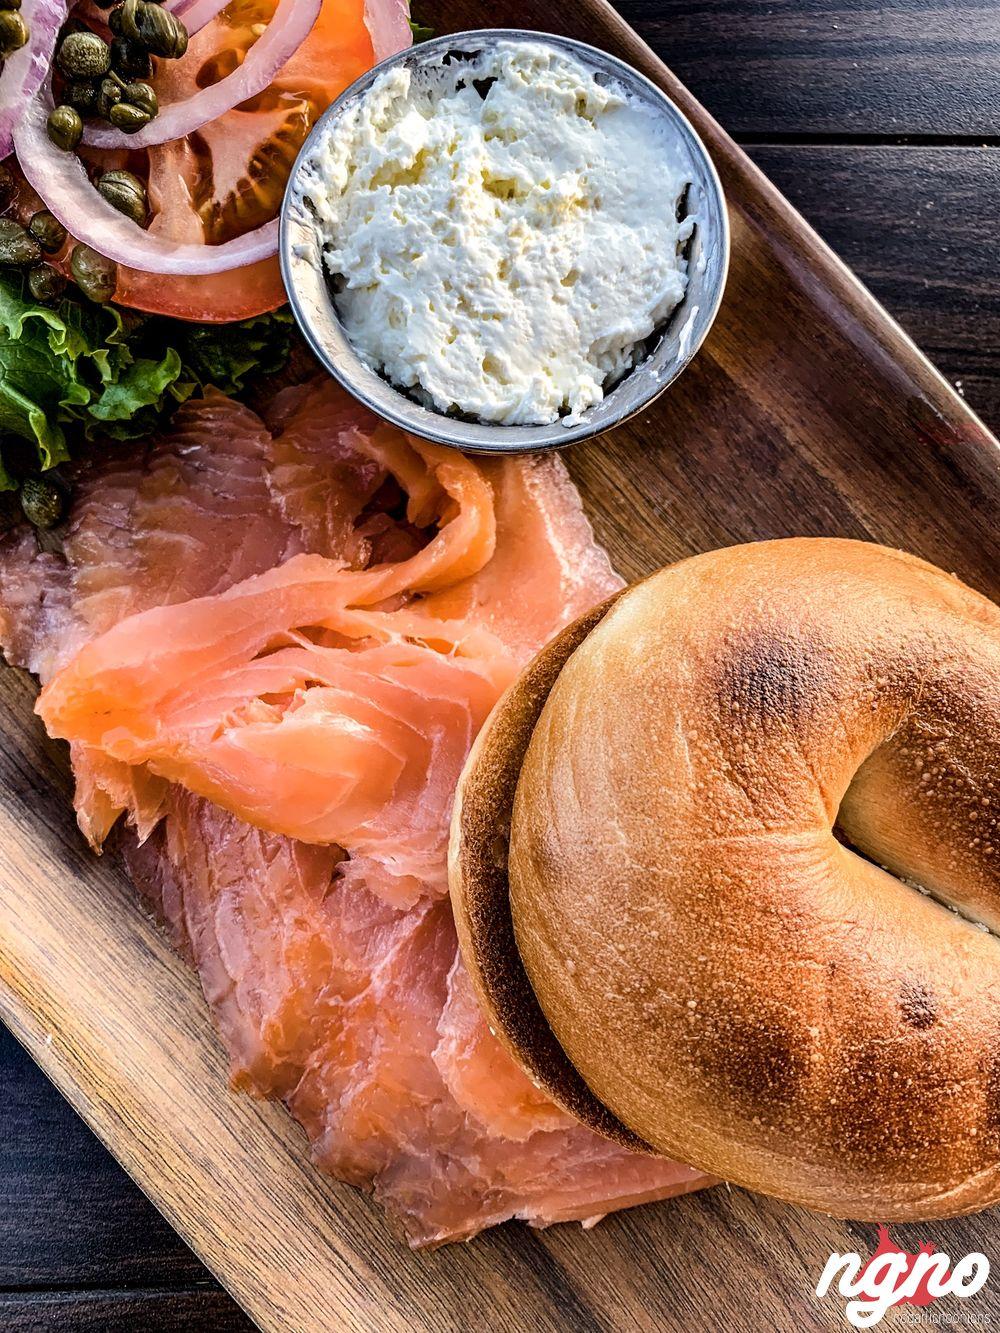 eight-am-san-francisco-breakfast-nogarlicnoonions-242018-10-22-07-53-02